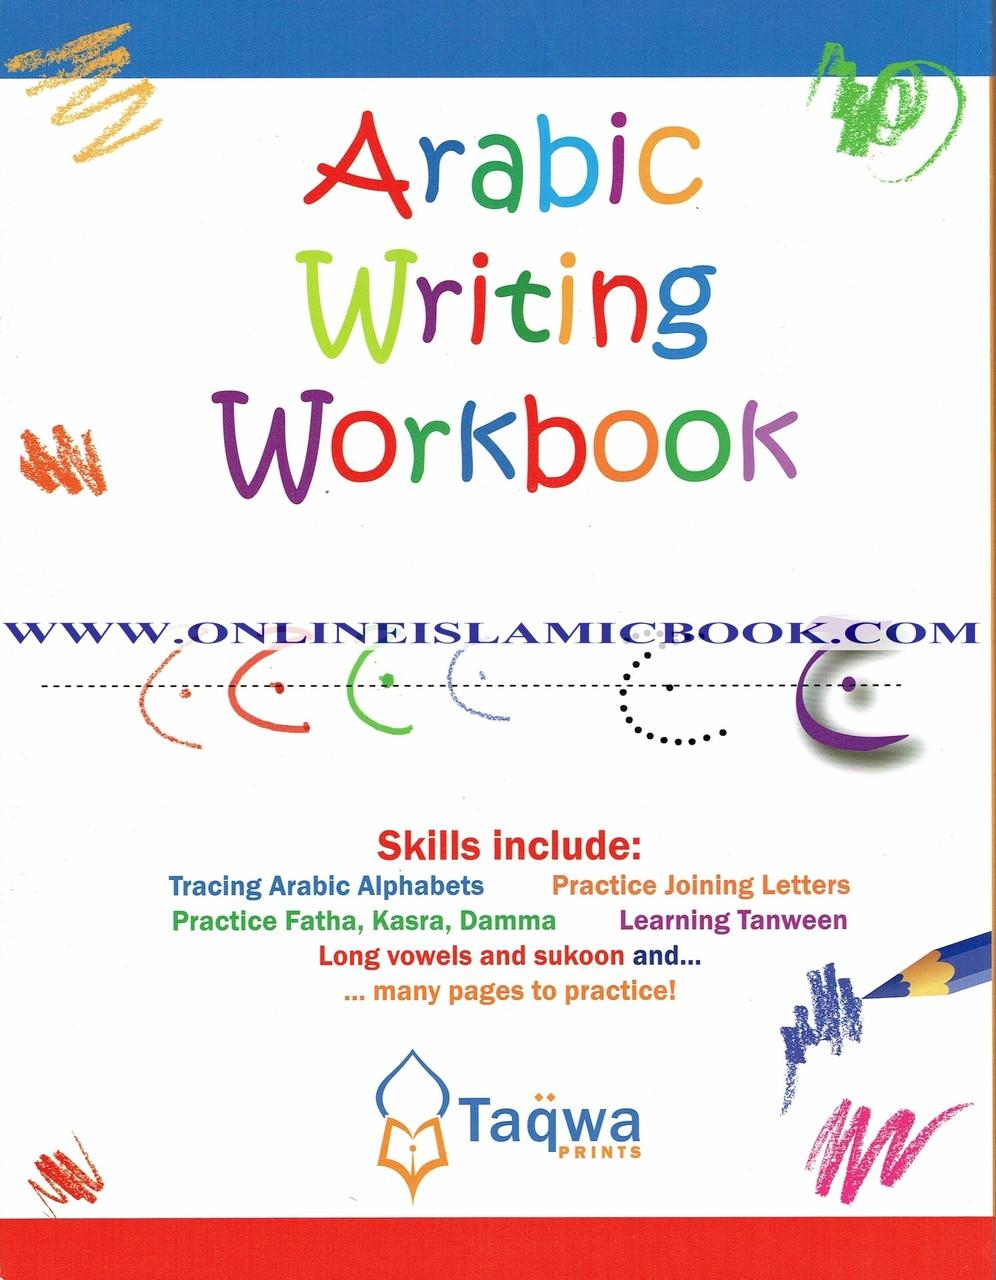 Workbooks workbook in spanish three years : Arabic Writing Workbook (Weekend Learning Publisher)